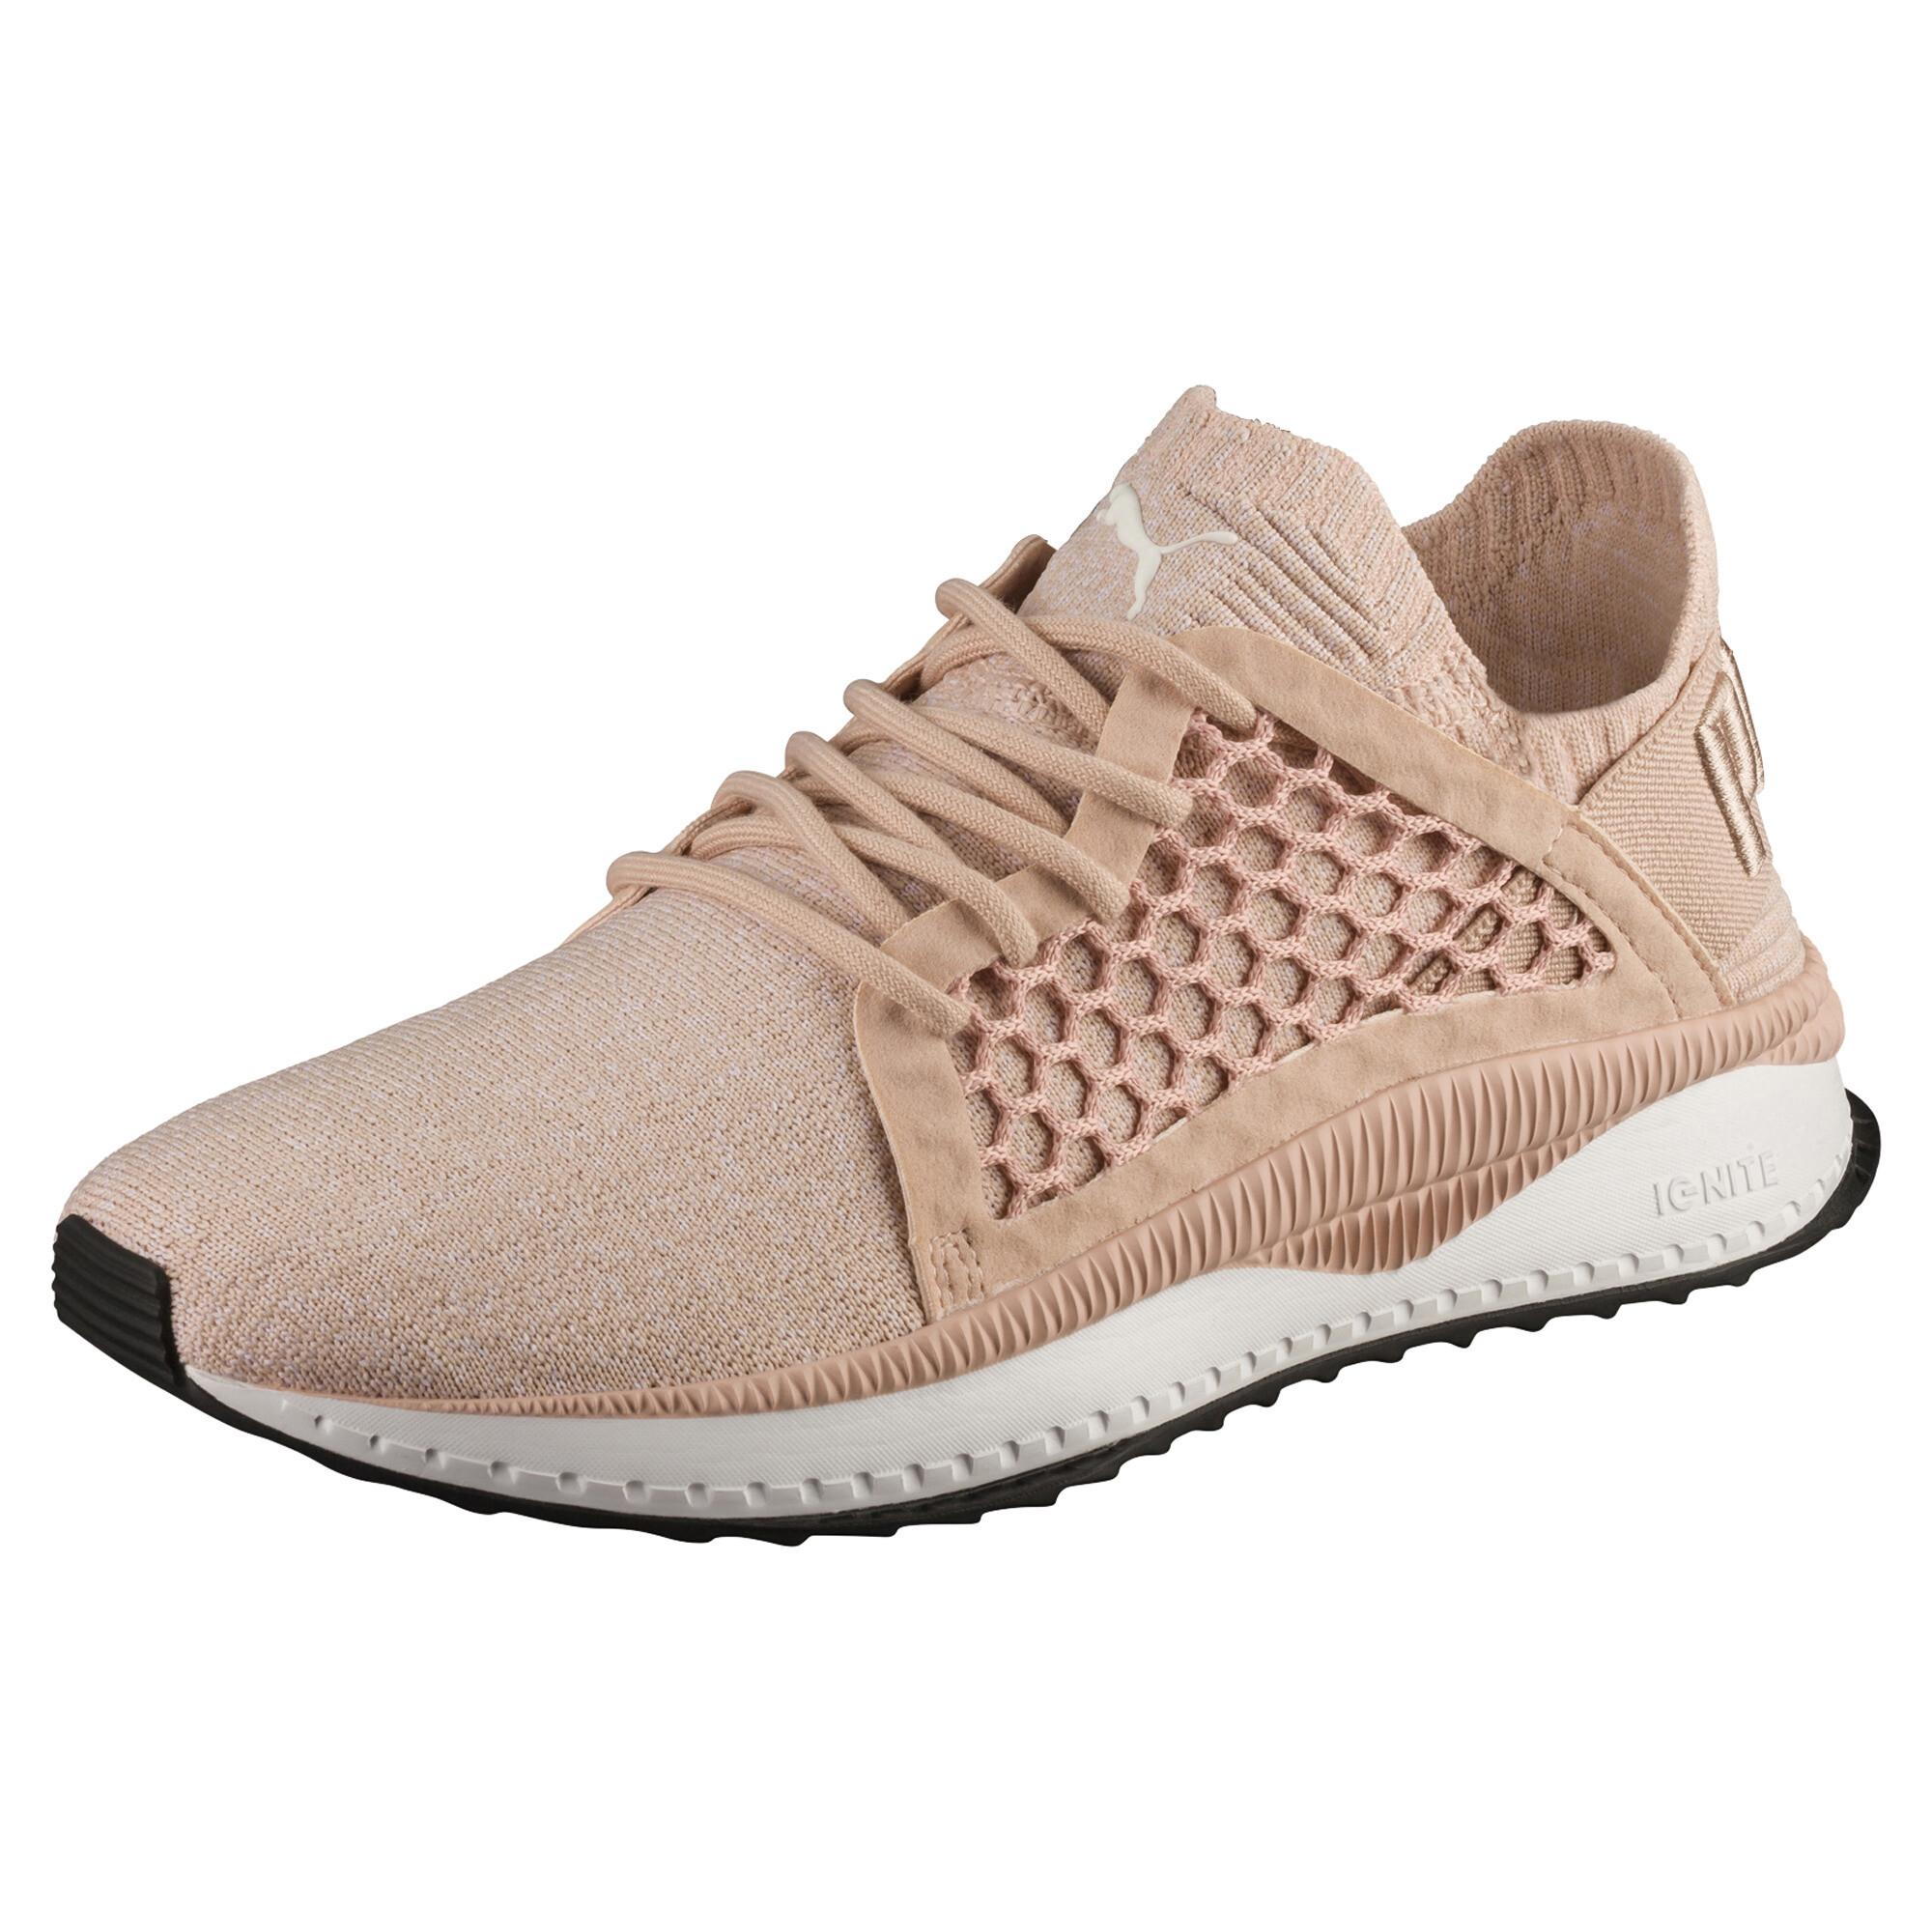 PUMA-TSUGI-NETFIT-evoKNIT-Sneaker-Frauen-Schuhe-Neu Indexbild 21